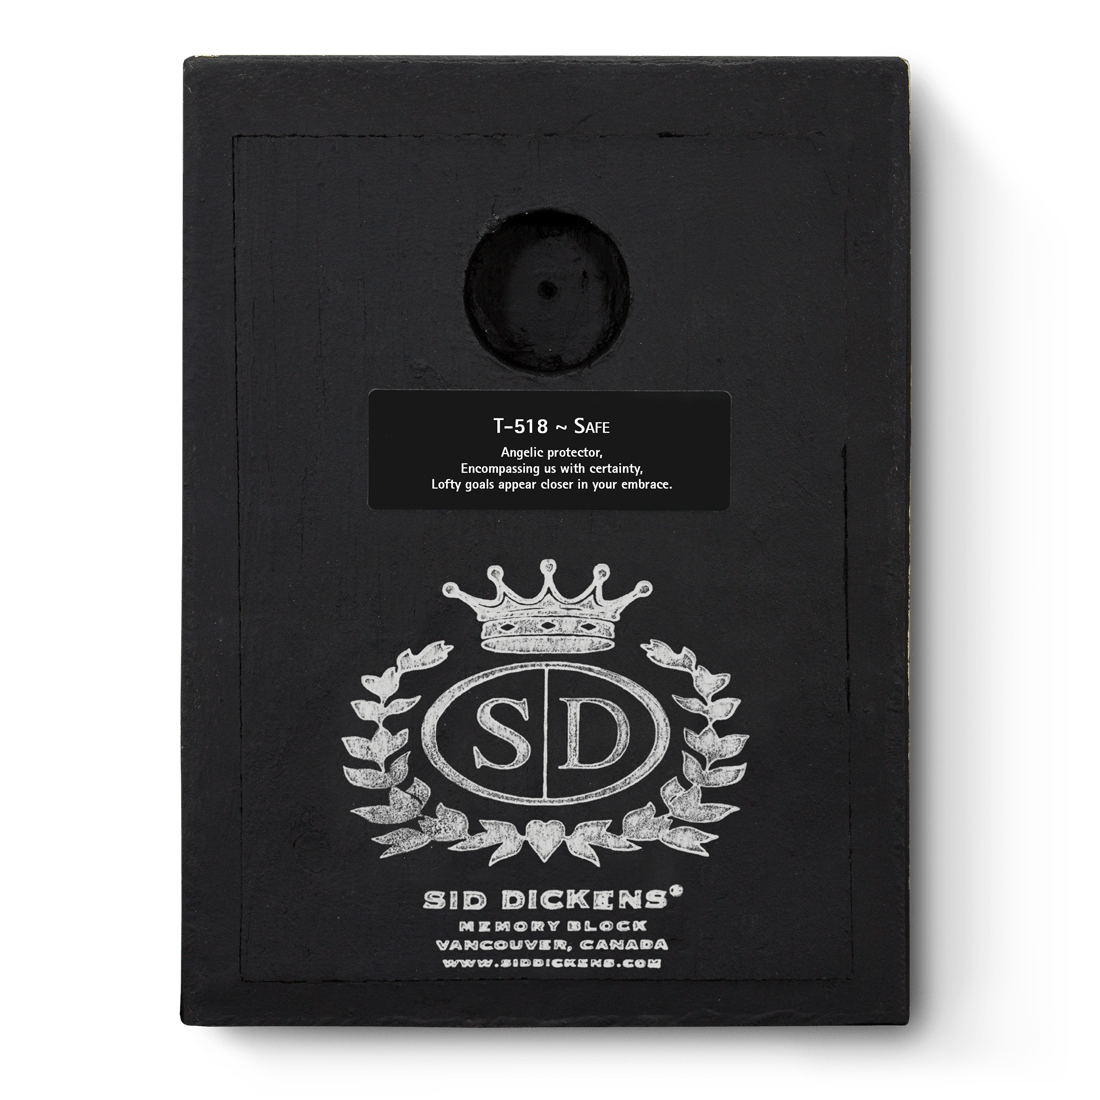 T518 - Safe - Memory Block Sid Dickens